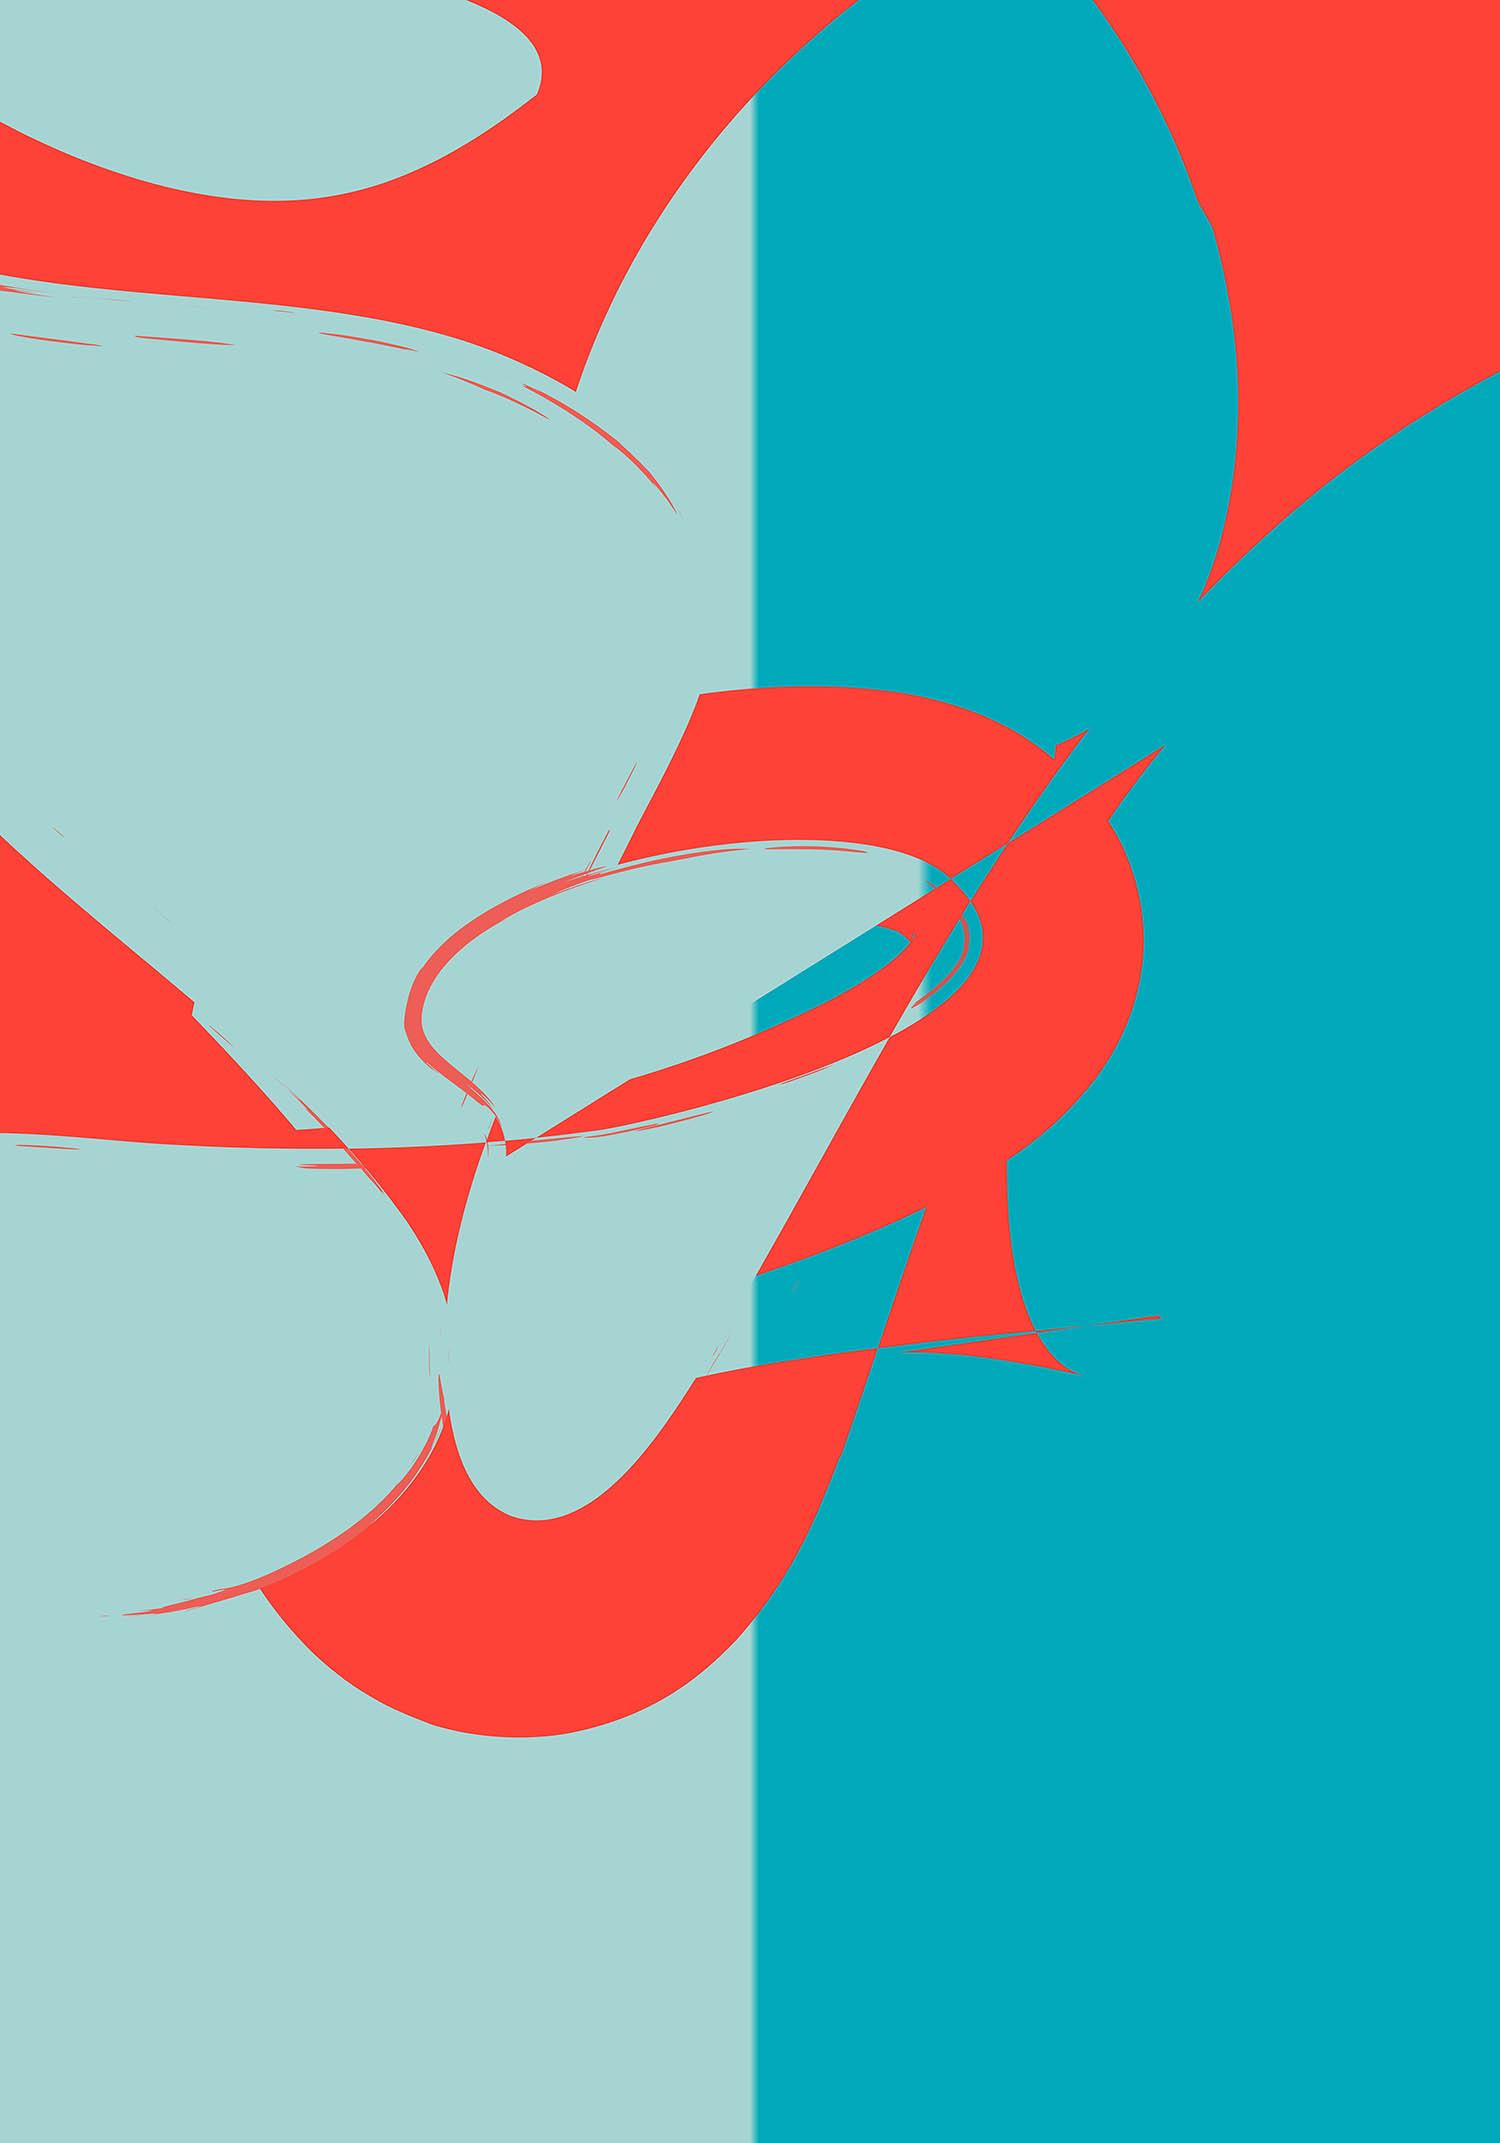 'oB 75', Cyan, Light Blue & Orange Abstract New Media Art Print by Greek multidisciplinary artist Kostas Gogas.